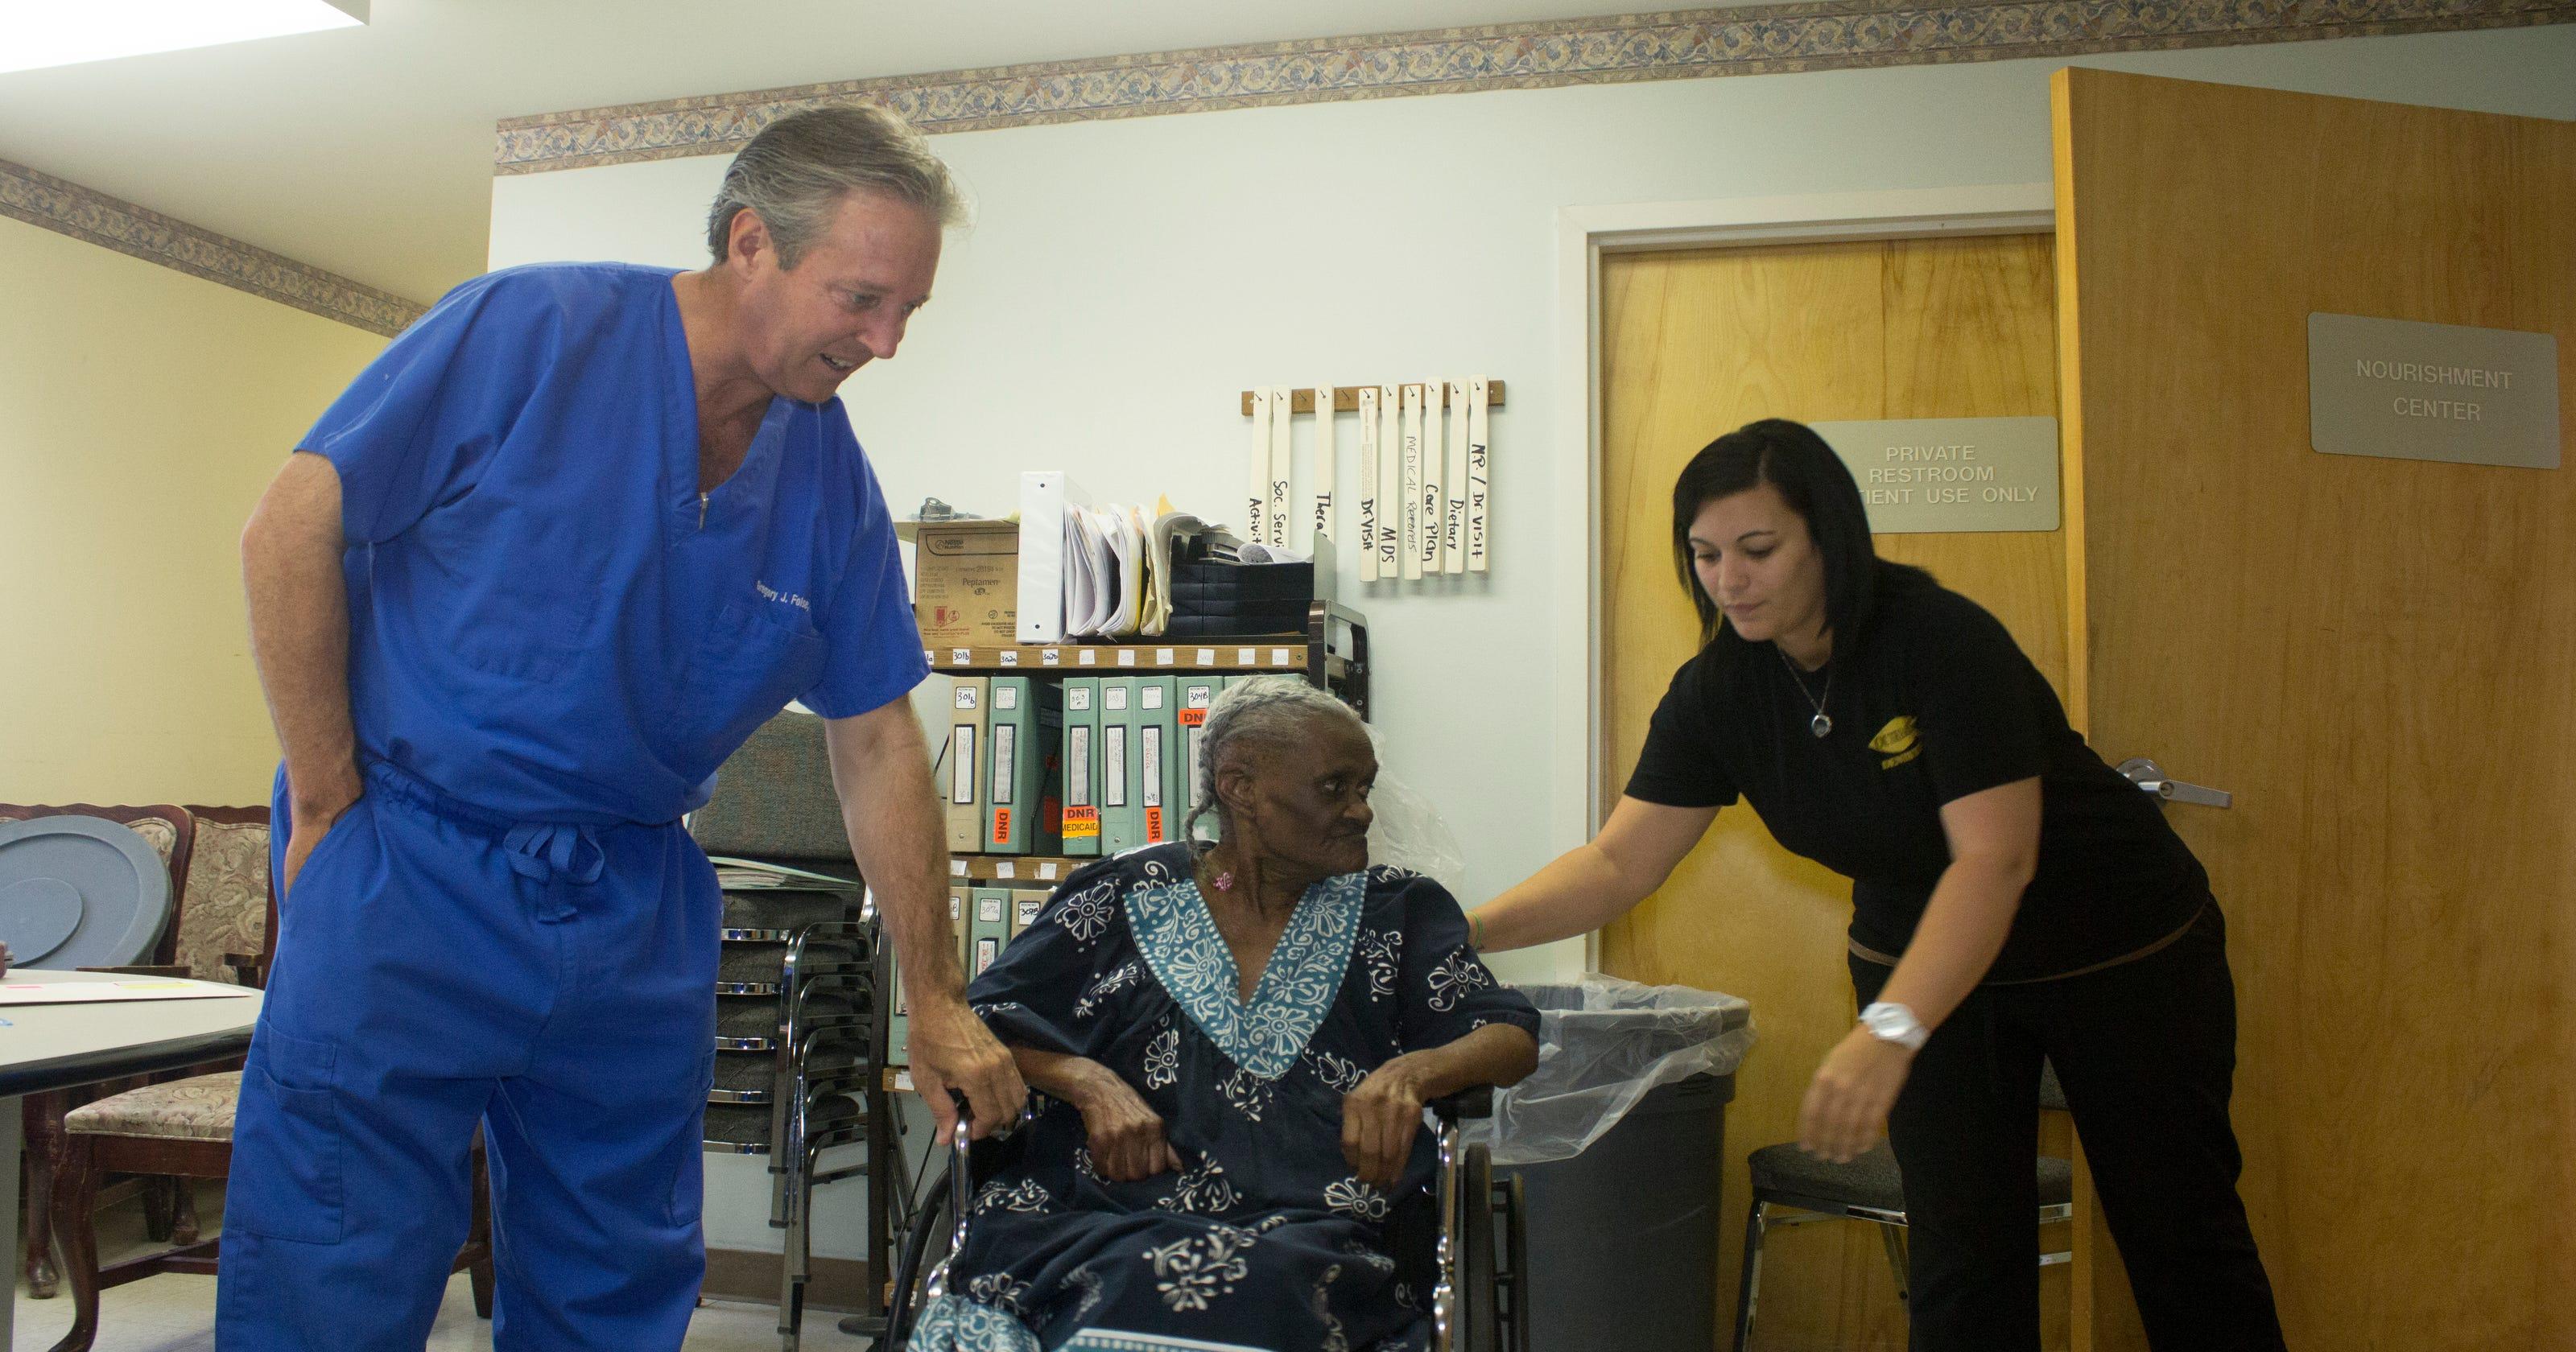 Acadiana people dentist hits the road to treat elderly